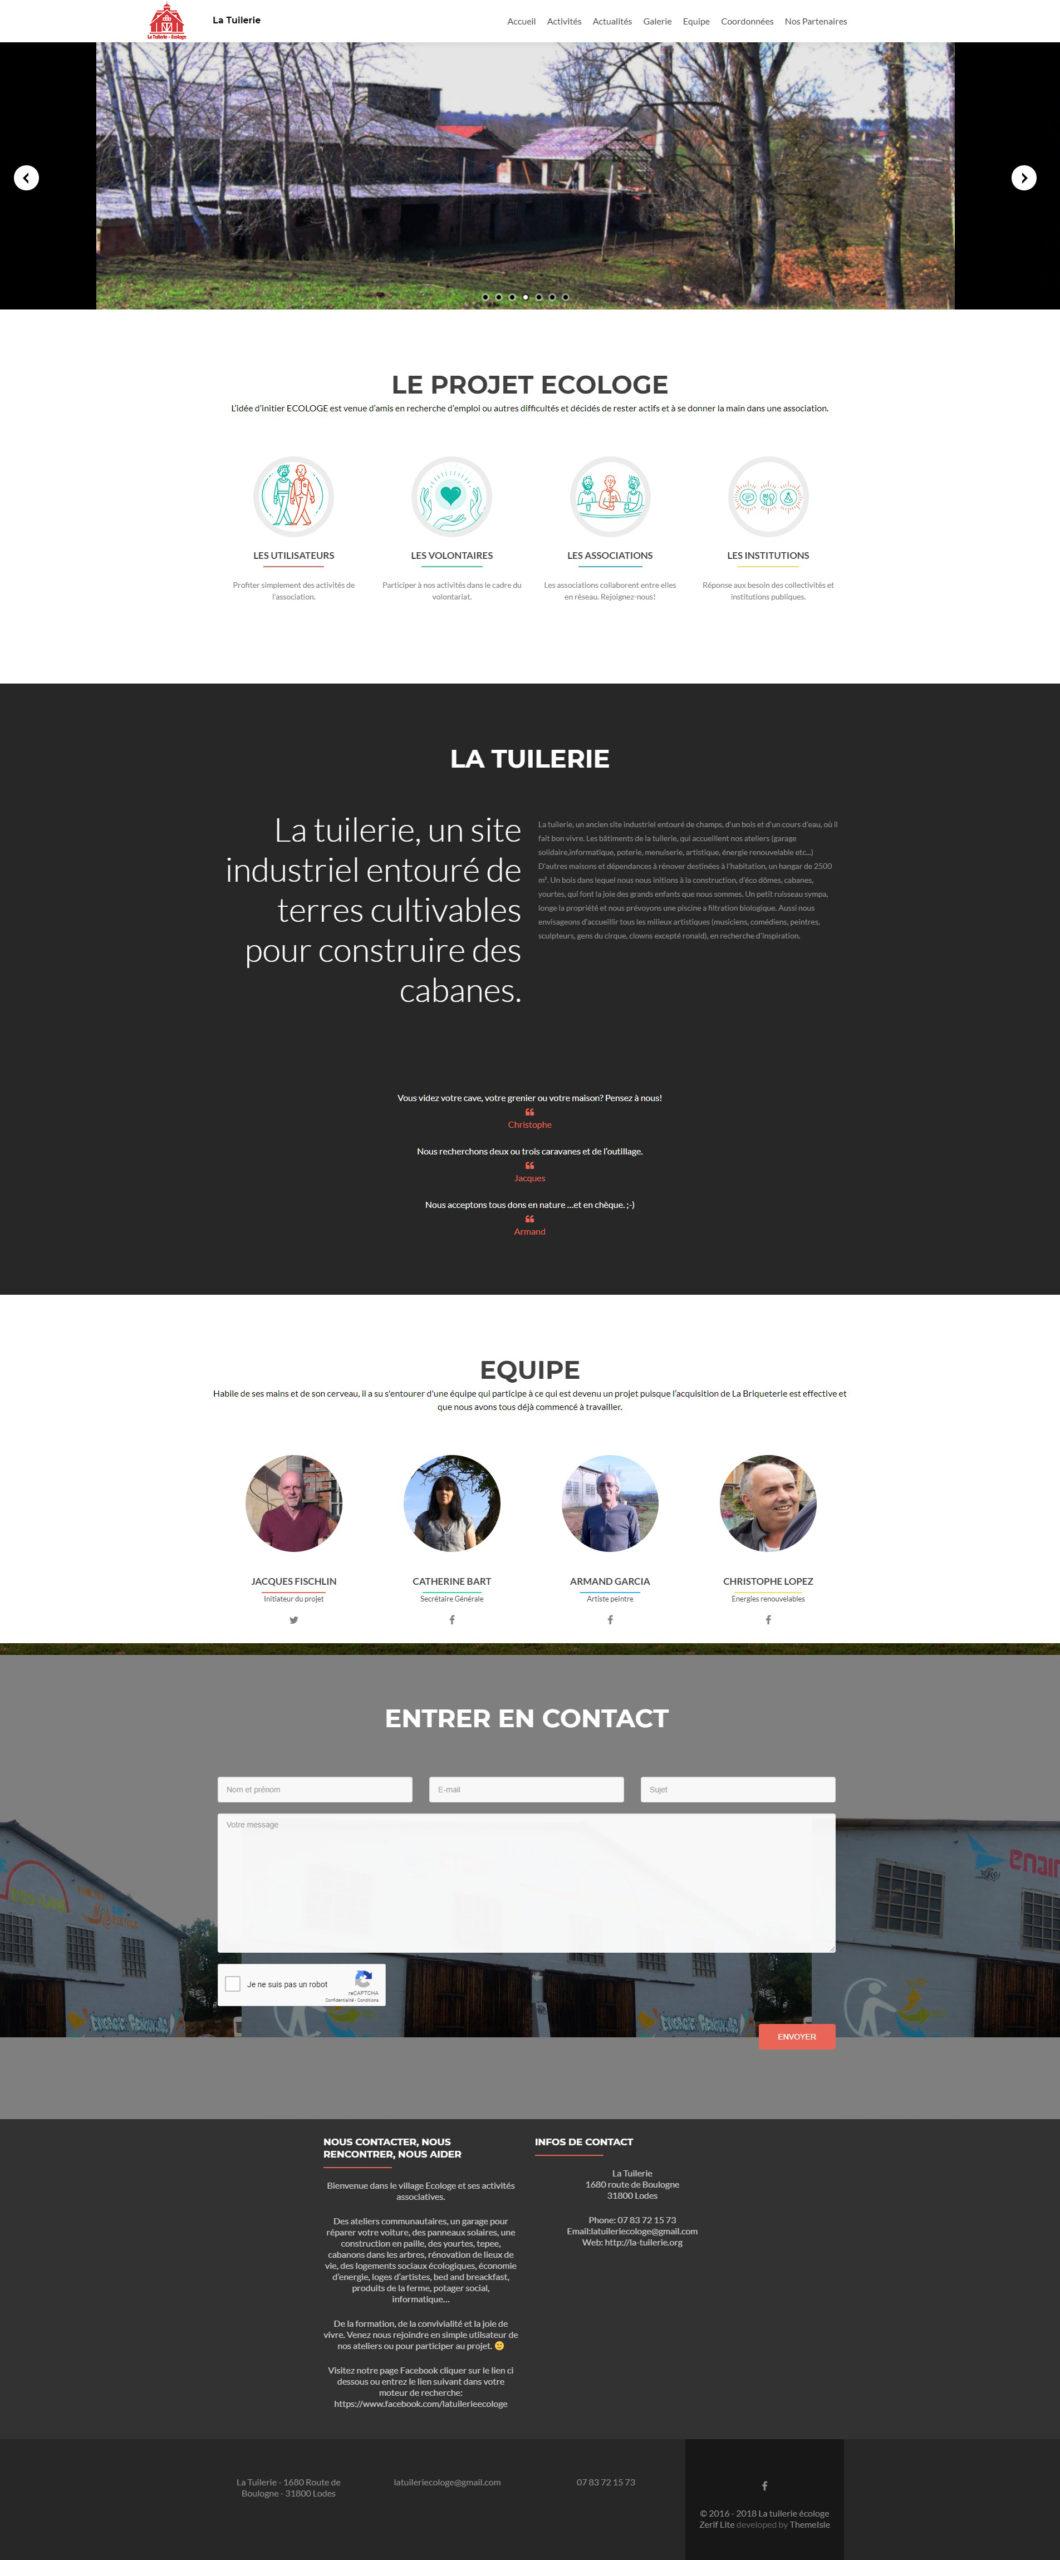 la-tuilerie.org